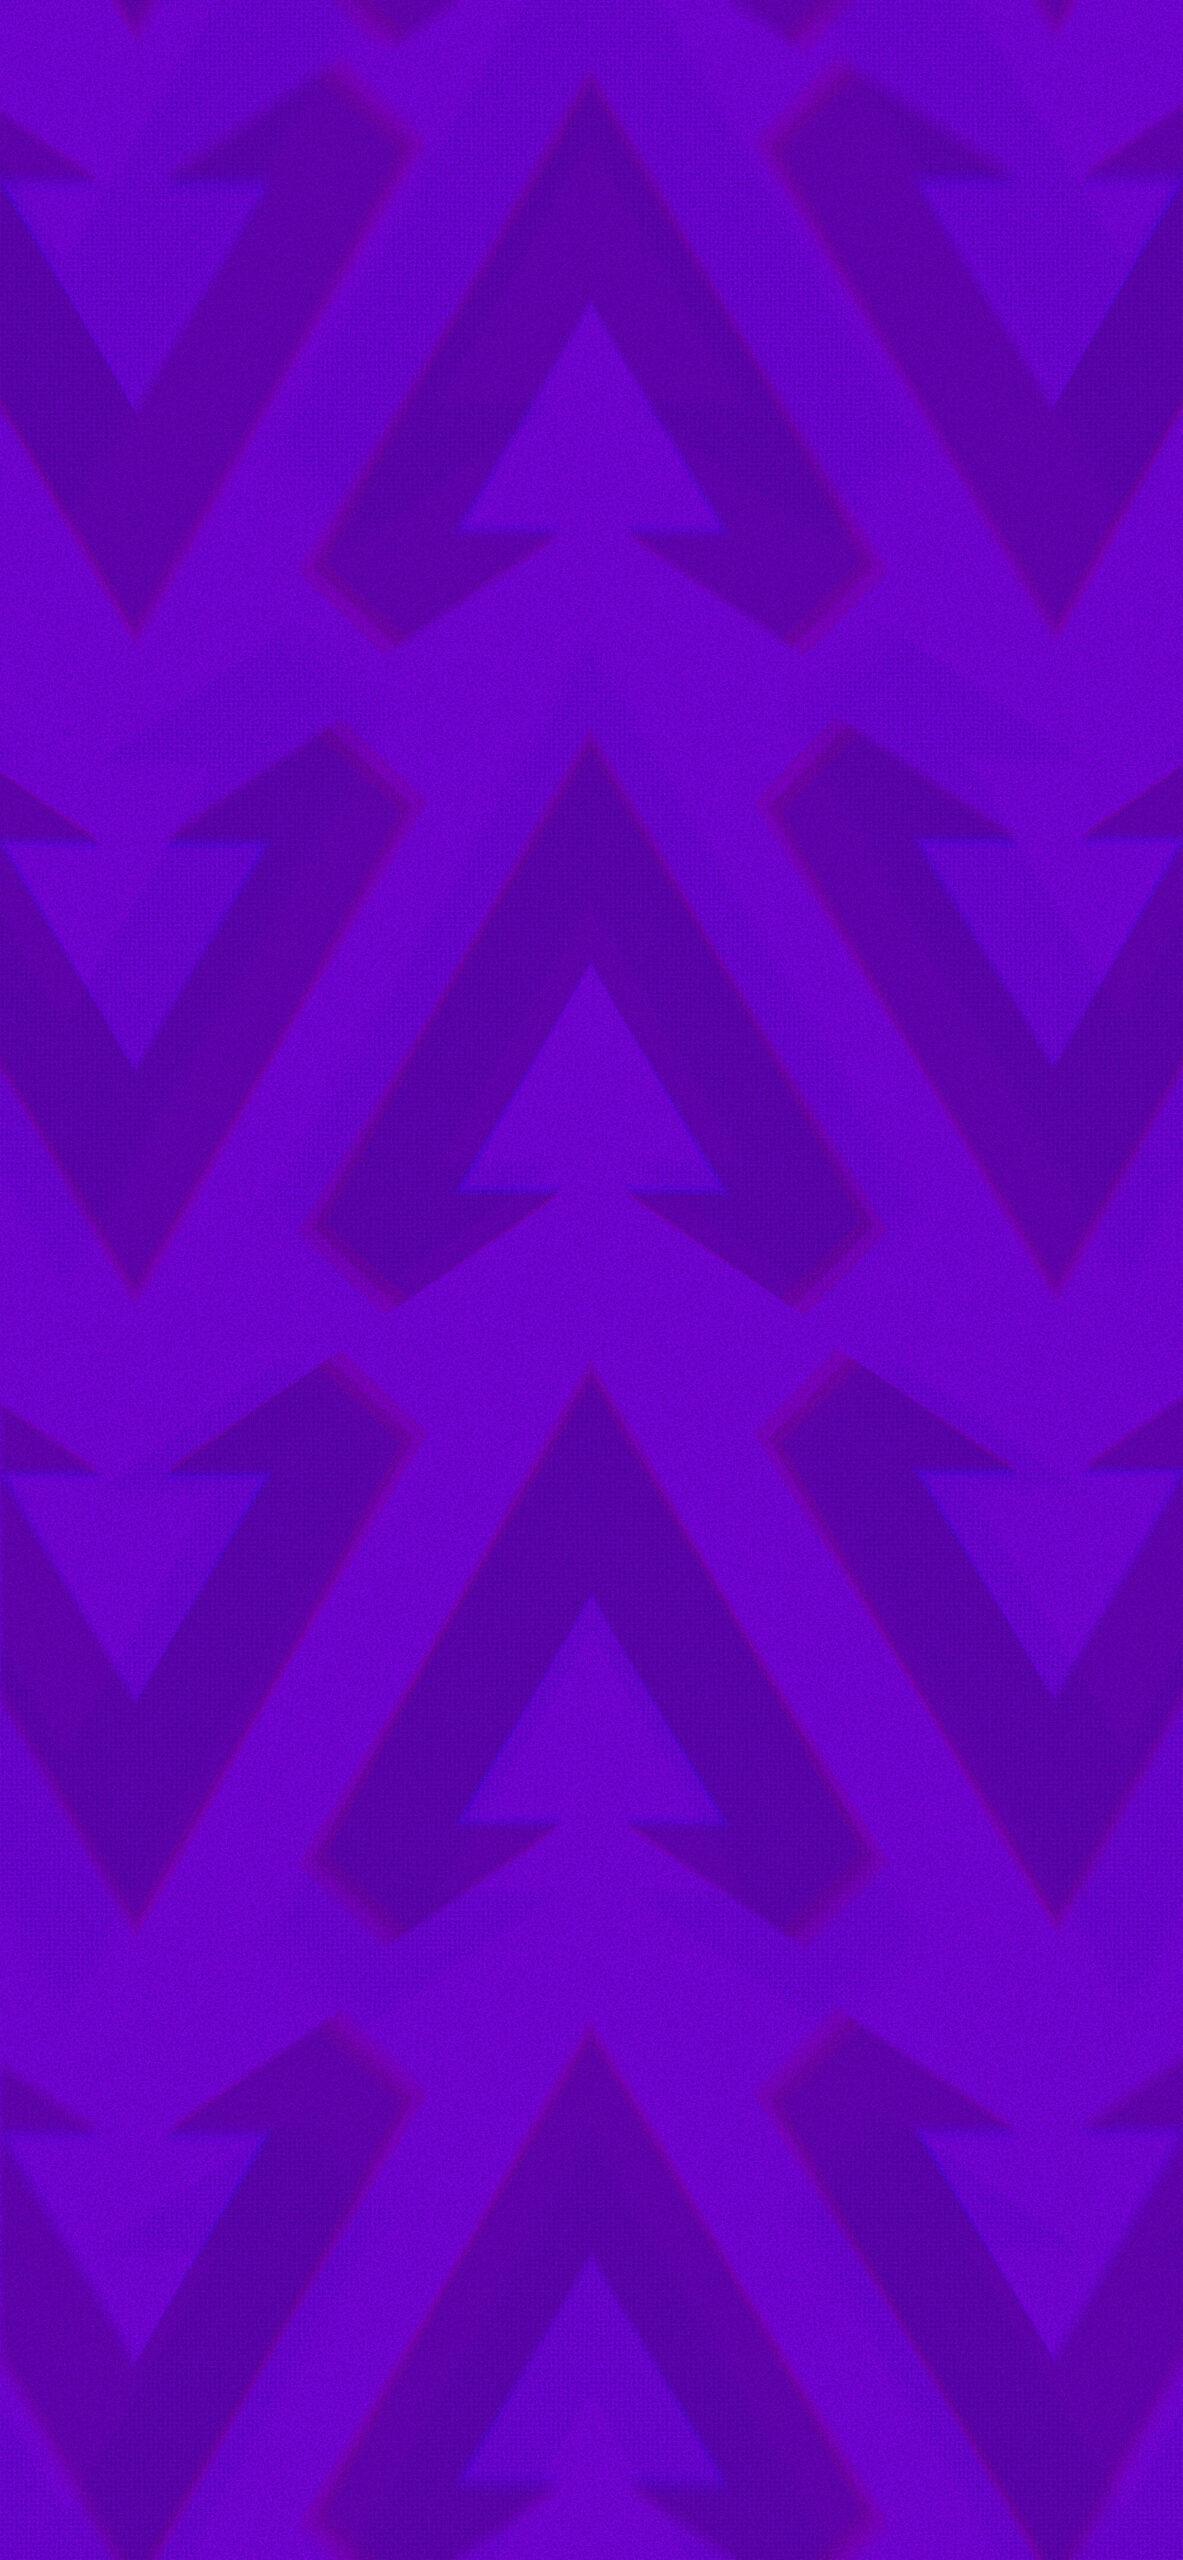 apex legends wraith purple background